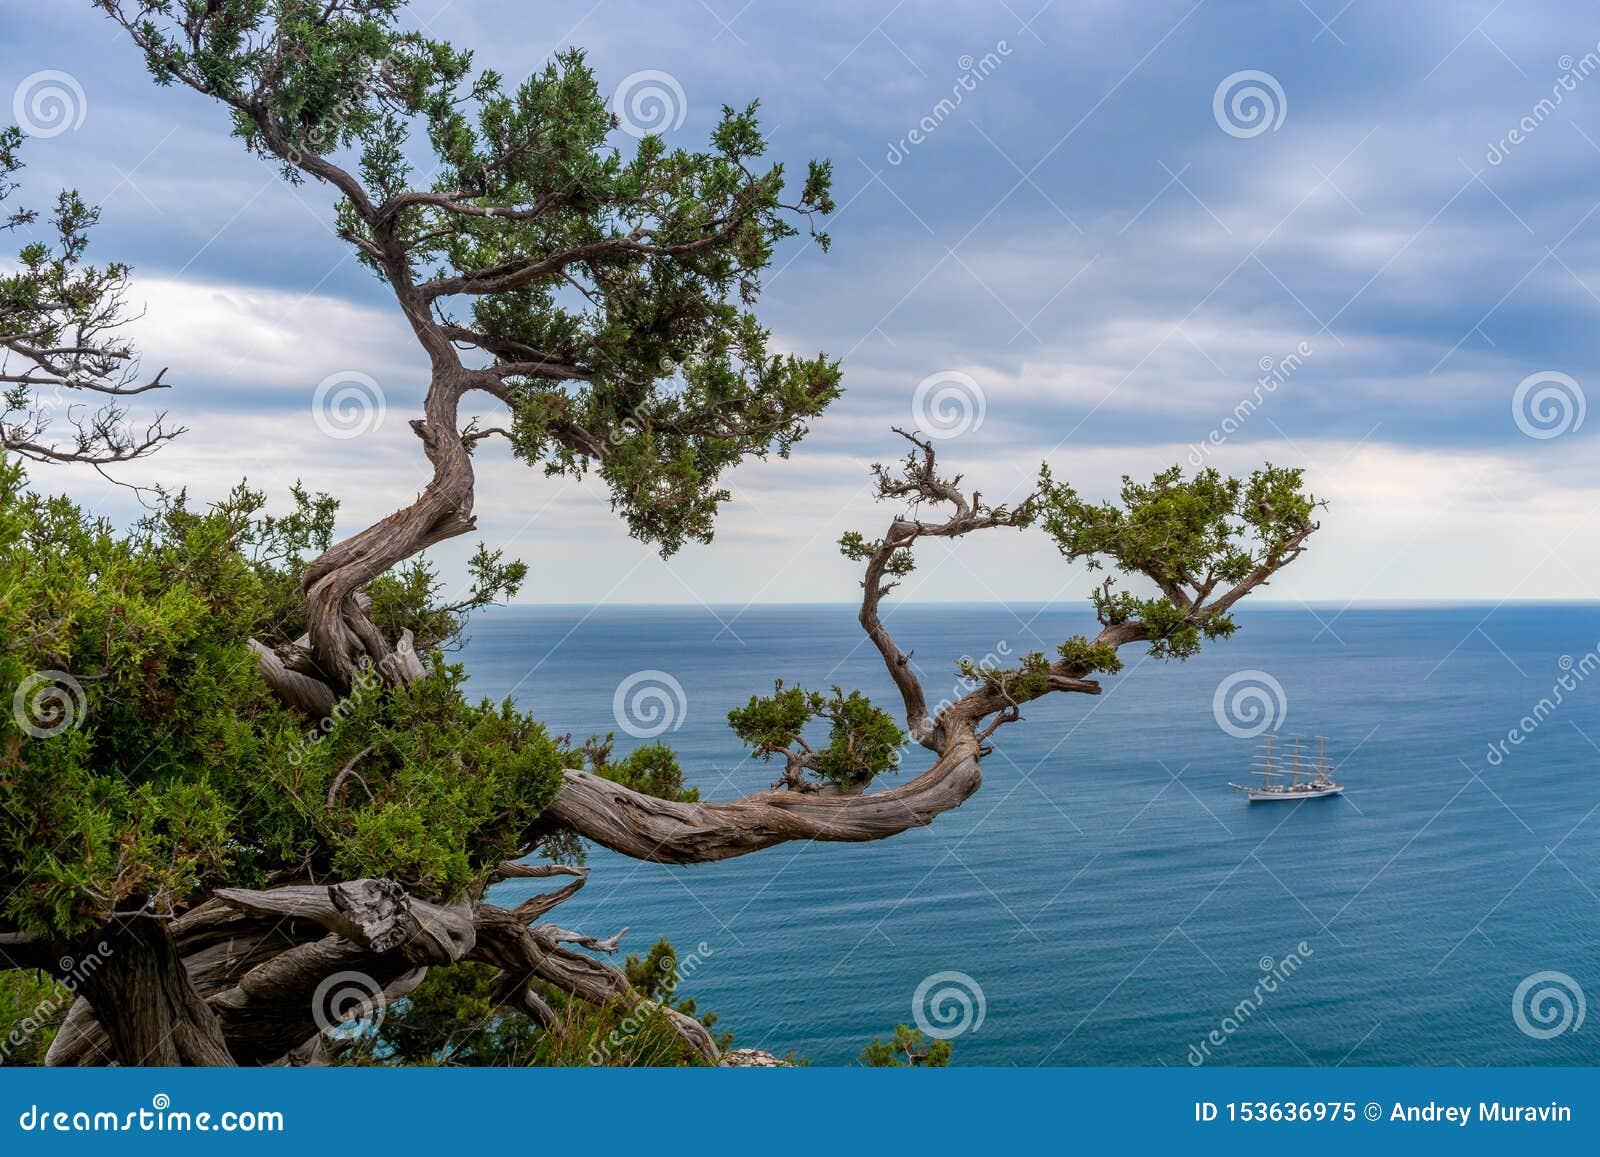 Парусник в заливе моря